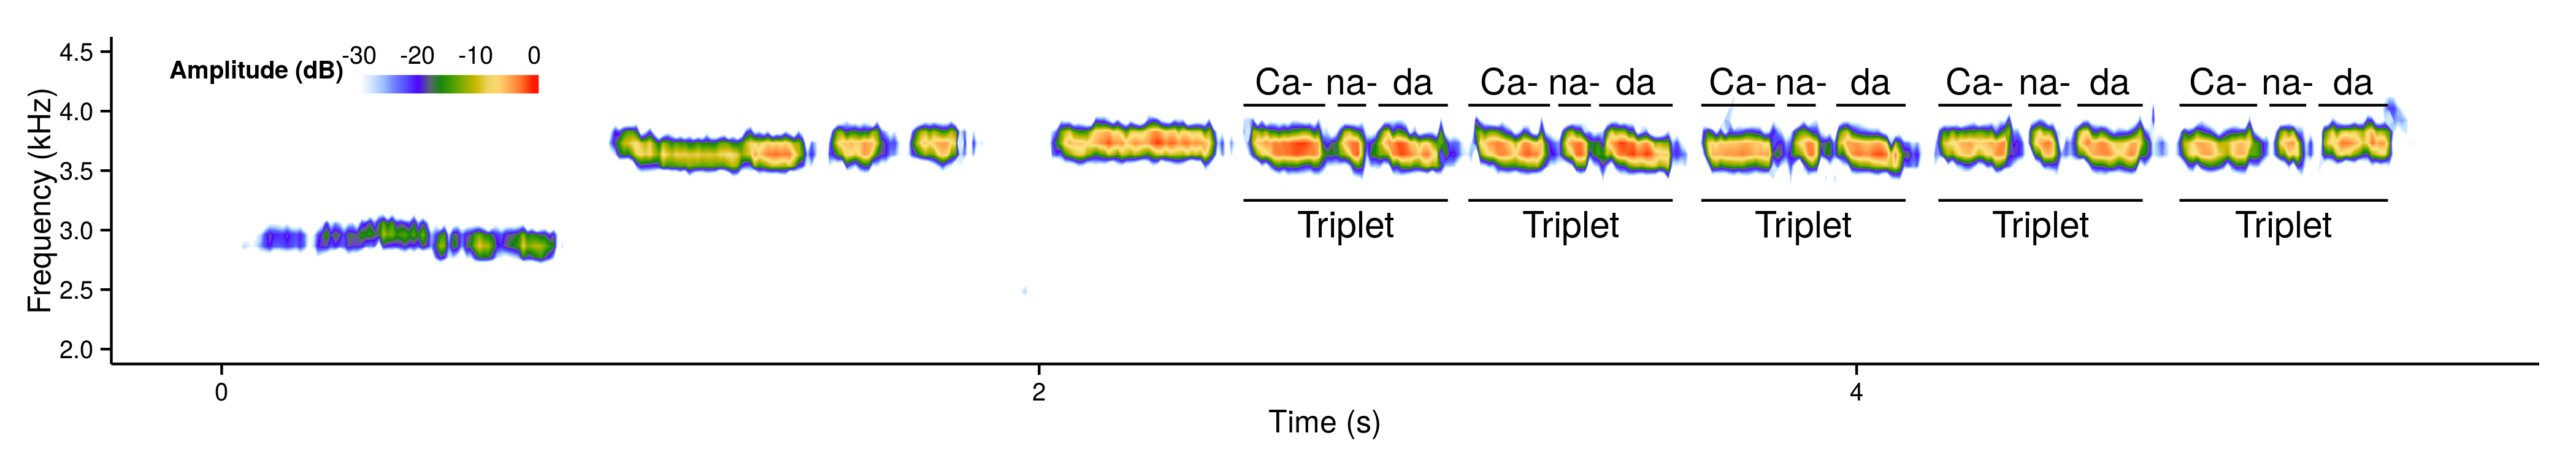 Triplet (Ca-na-da) Courtesy of Paul Marvin on XC